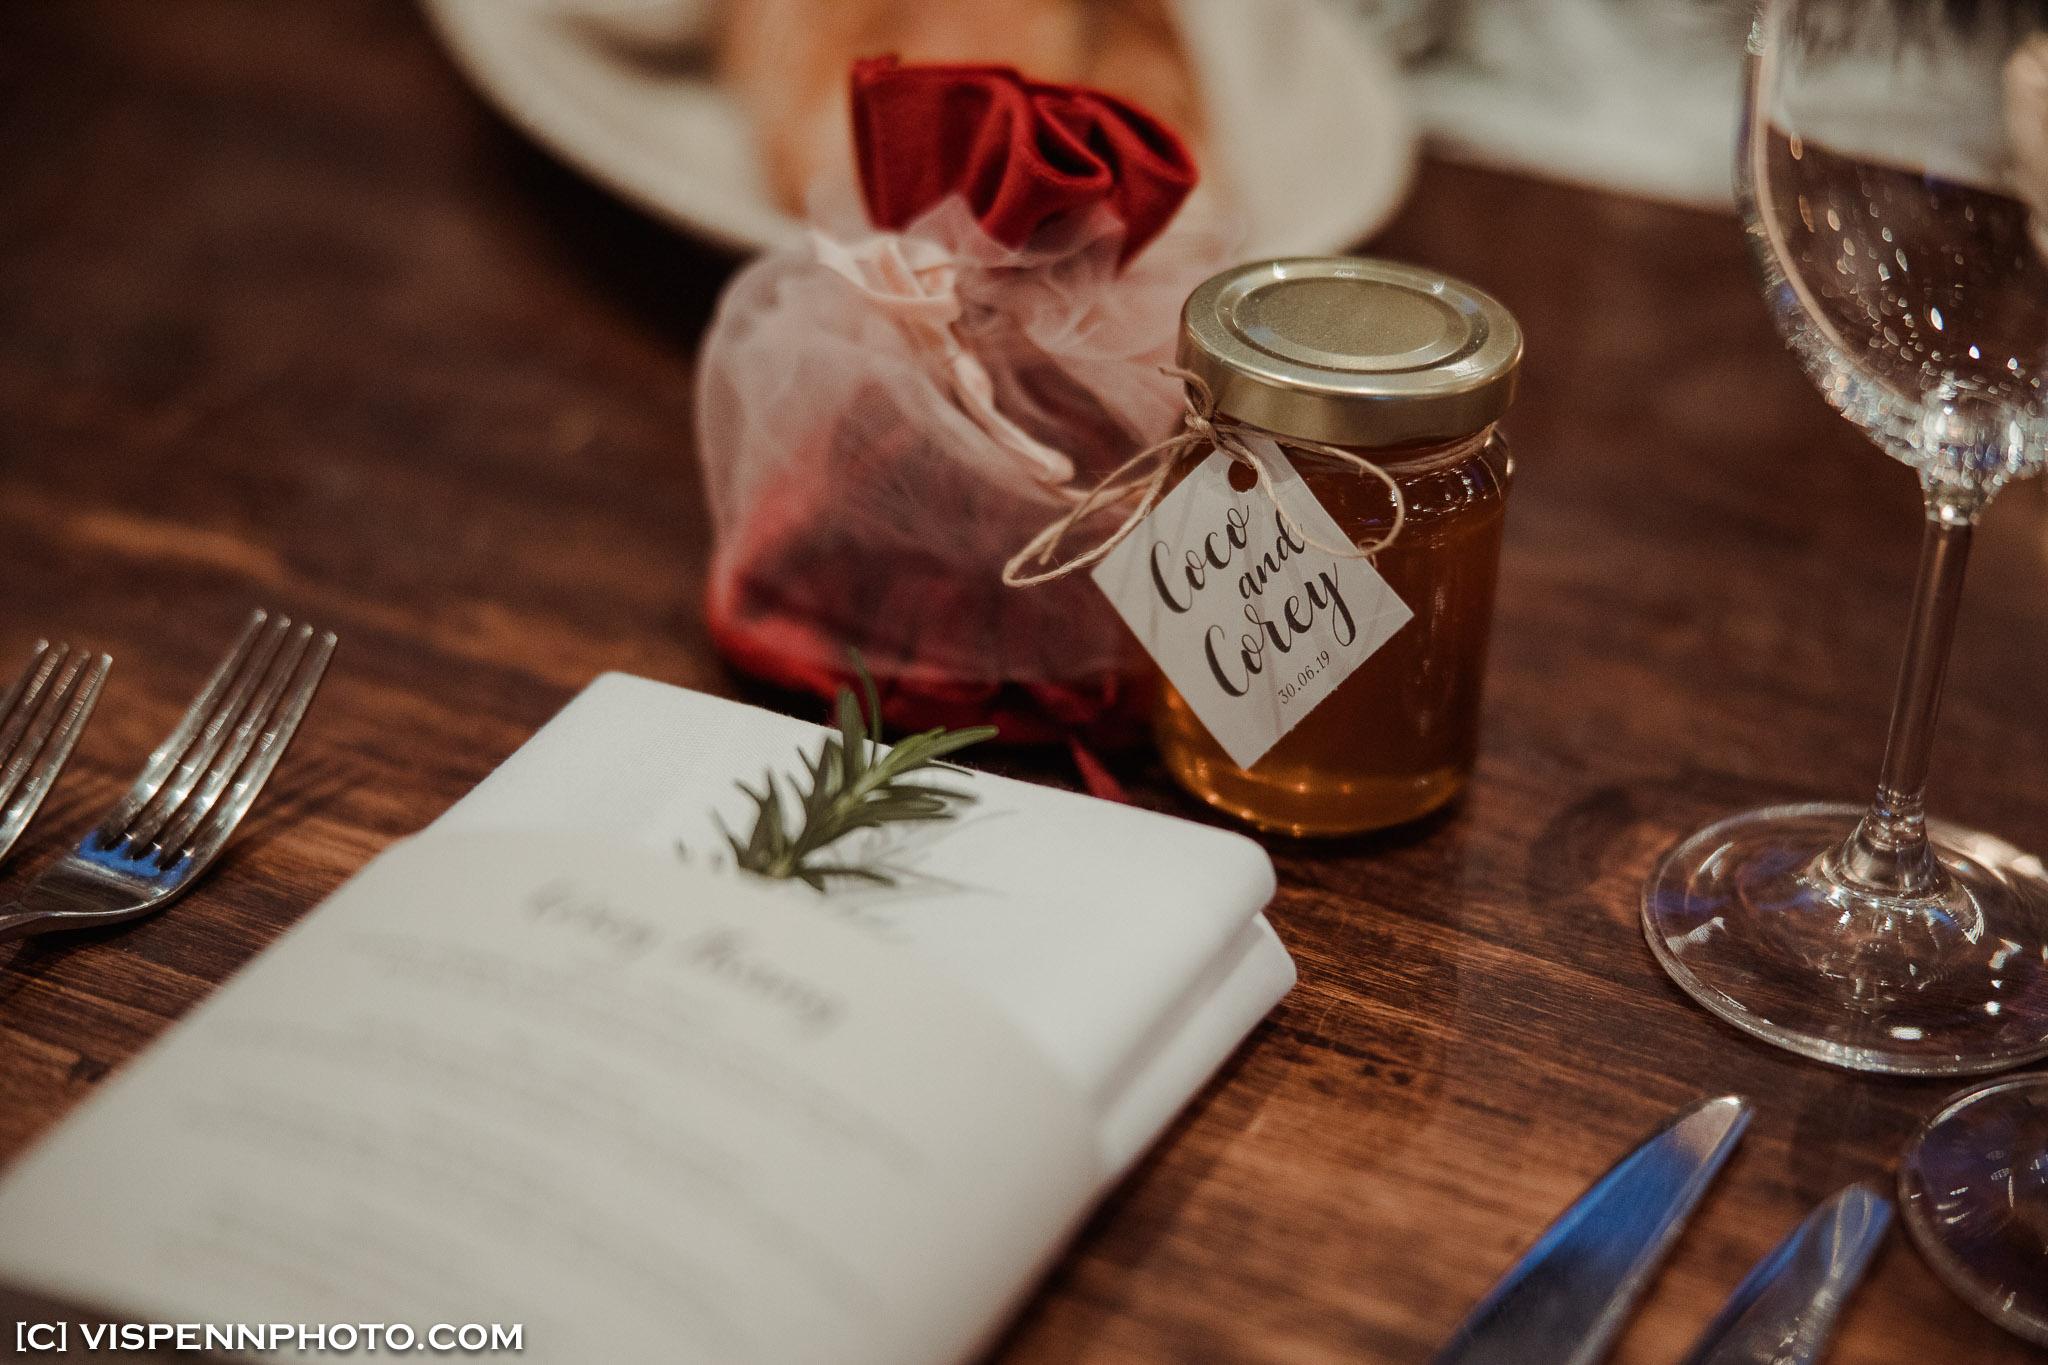 WEDDING DAY Photography Melbourne VISPENN 墨尔本 婚礼跟拍 婚礼摄像 婚礼摄影 结婚照 登记照 CoreyCoco 1P 04852 EOSR VISPENN